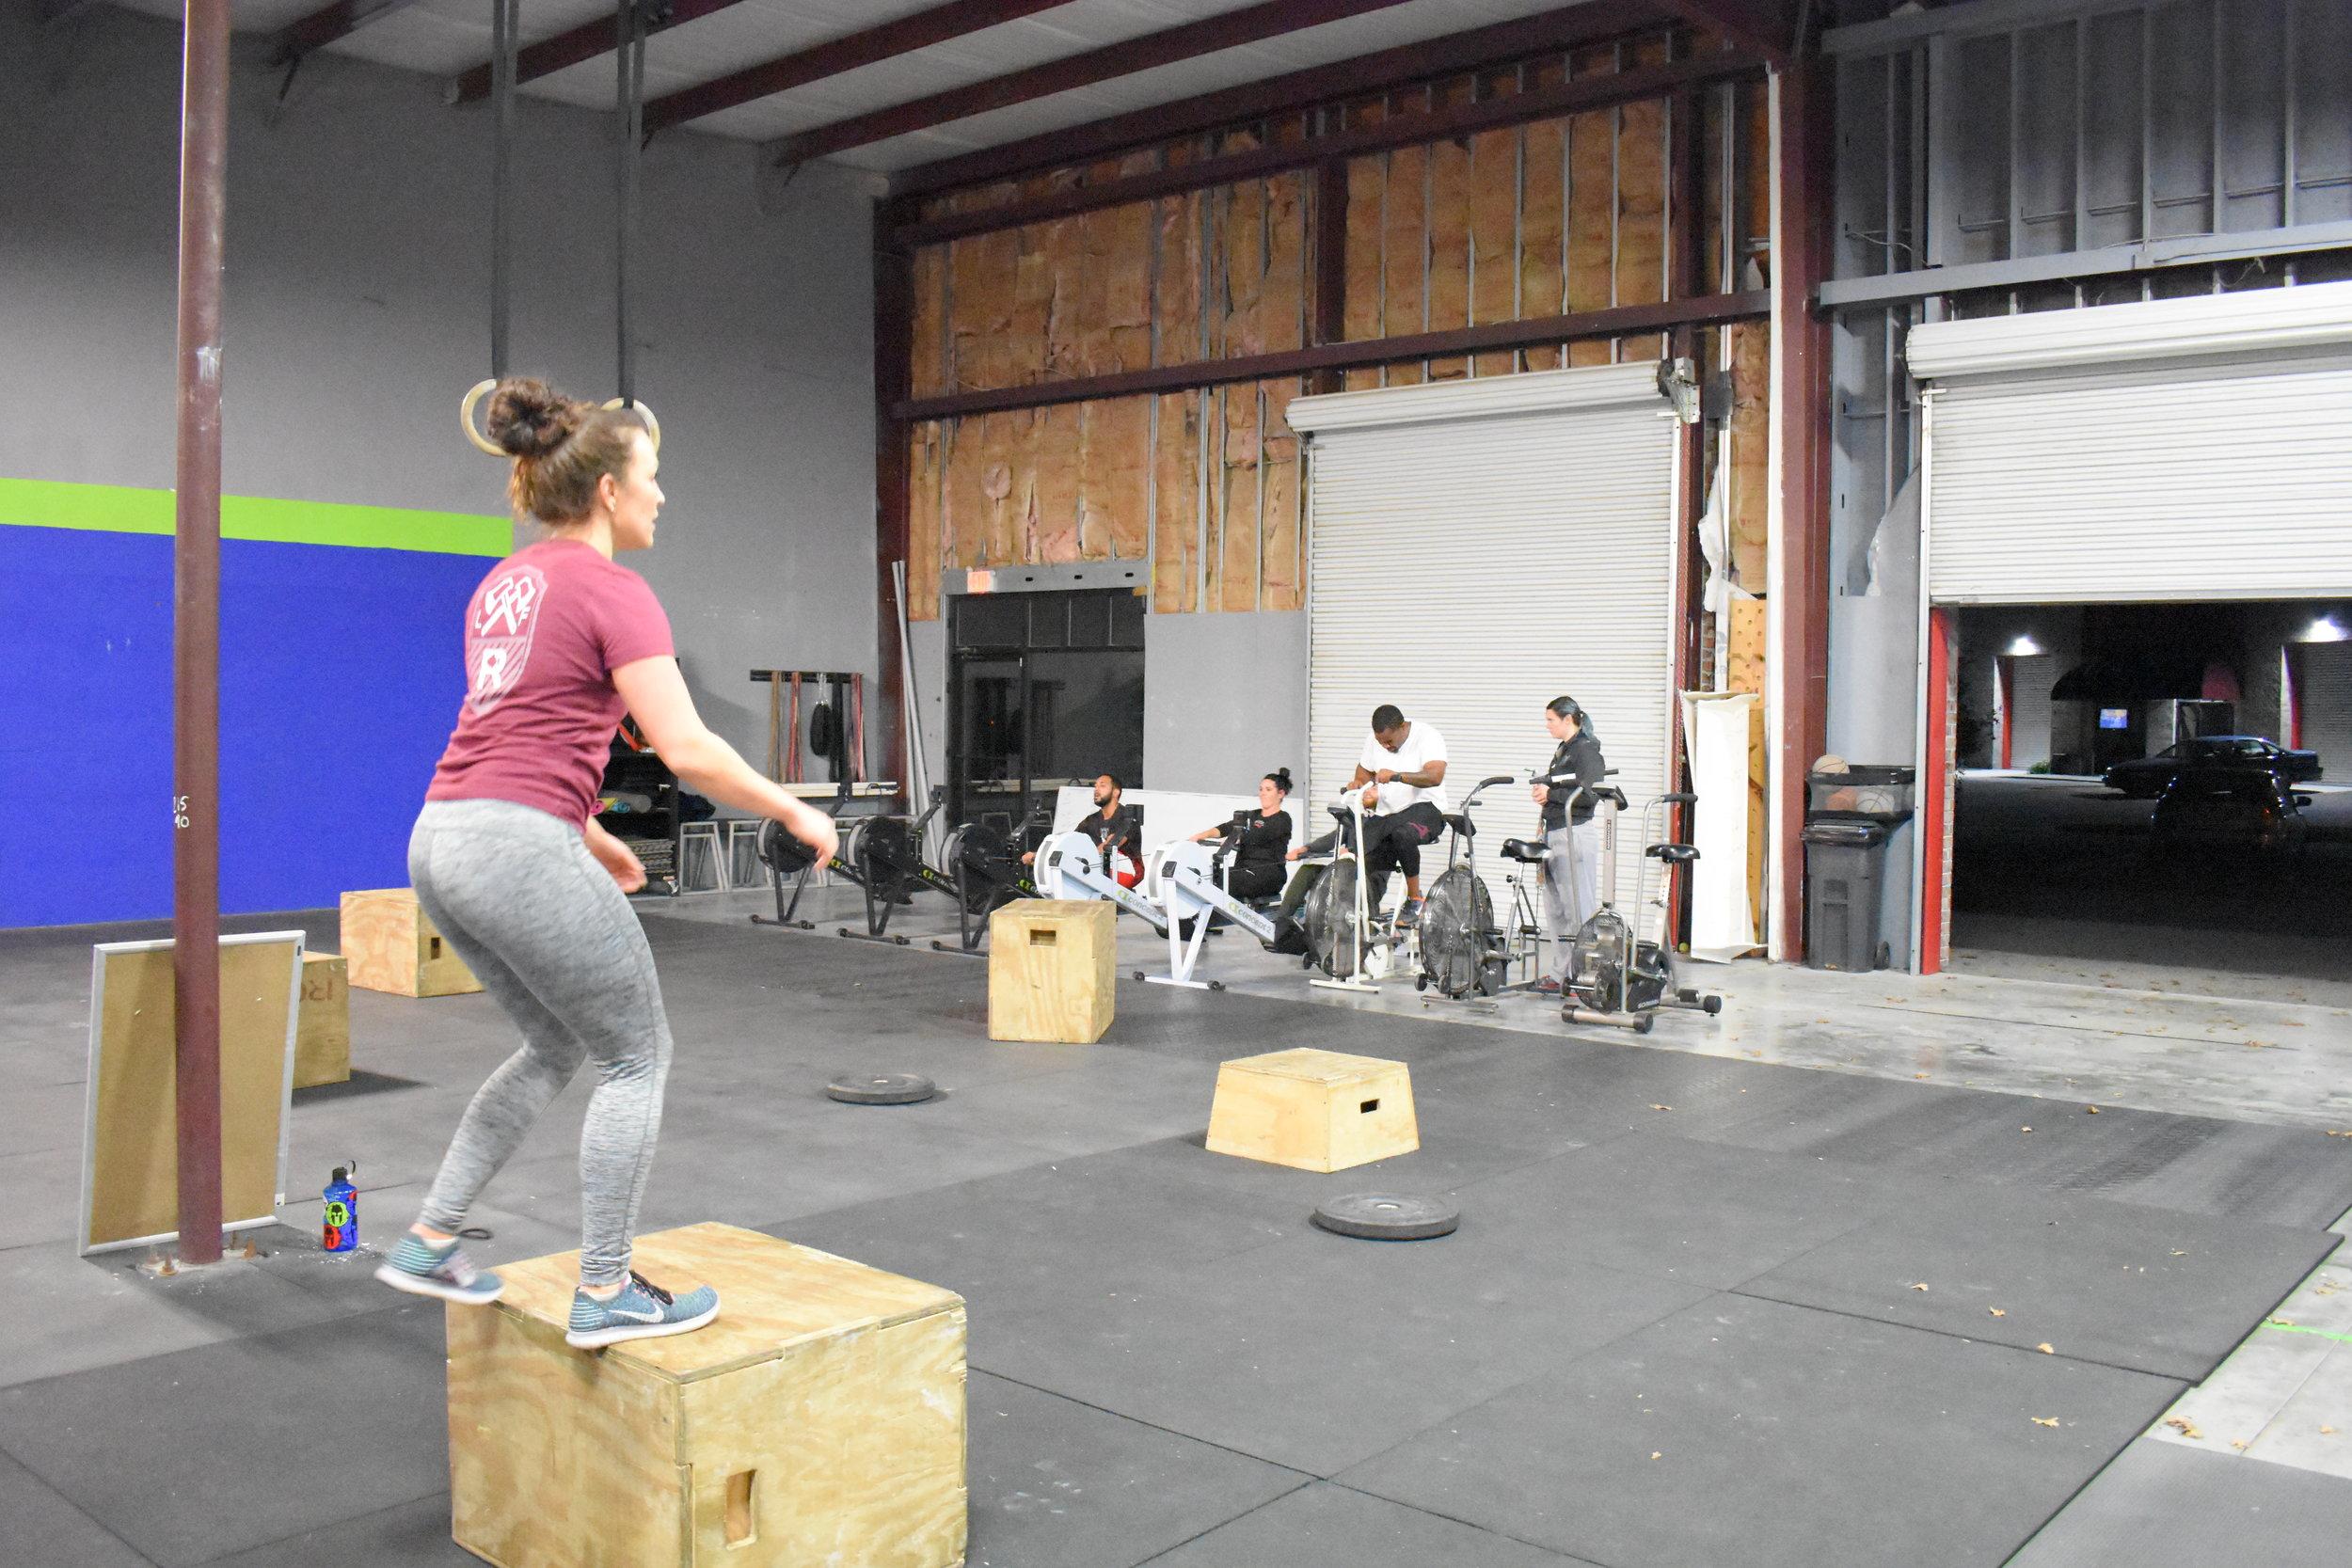 WORKOUT EMOM x 12 MINUTES Minute 1 - 24 Air Squats Minute 2 - 16 Wall Balls (20/14) Minute 3 - 8 Hang Squat Clean (95/65)|(75/55)